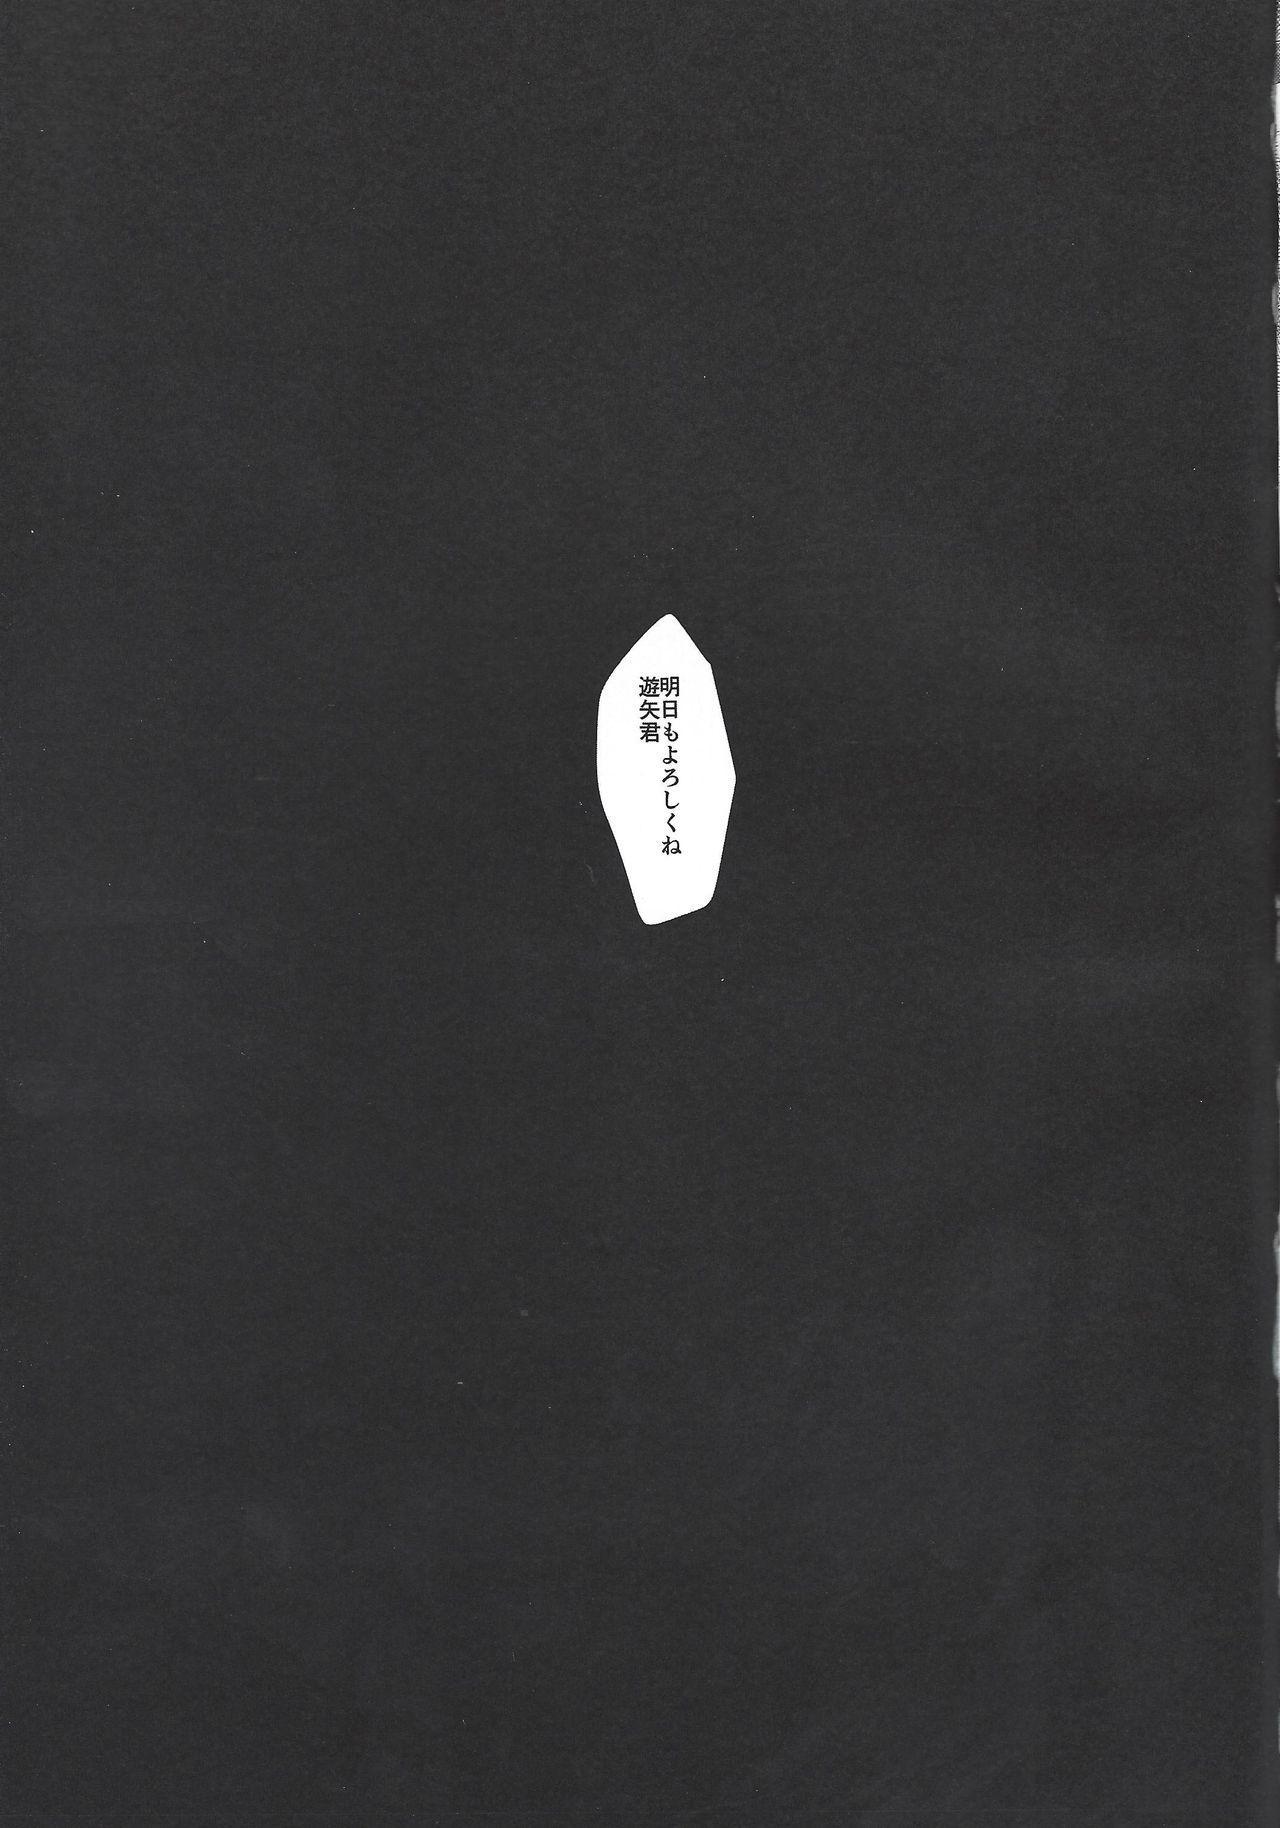 Kyousei Seieki Sakushu 15